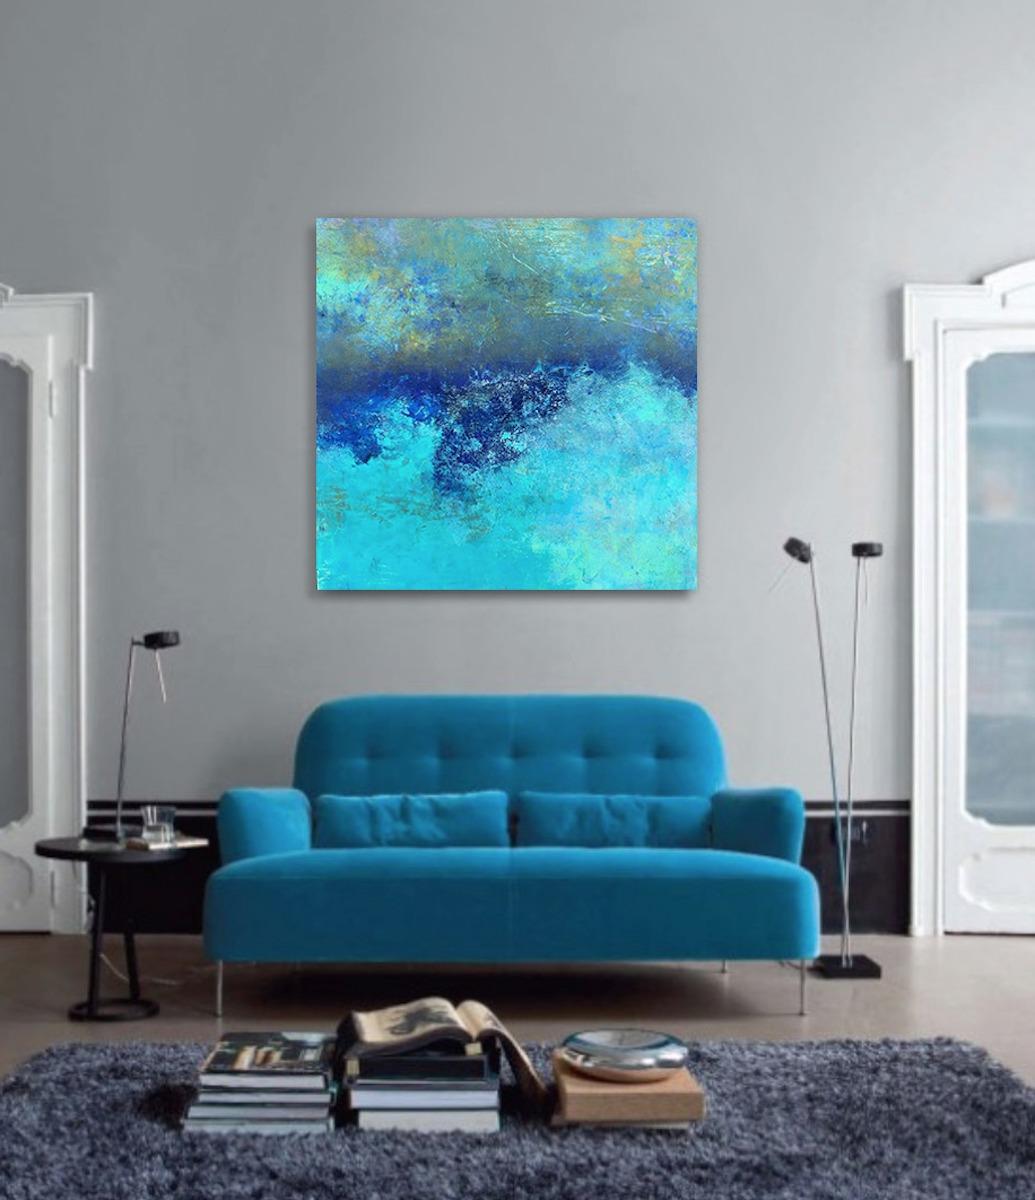 Vibrant Seas (large view)